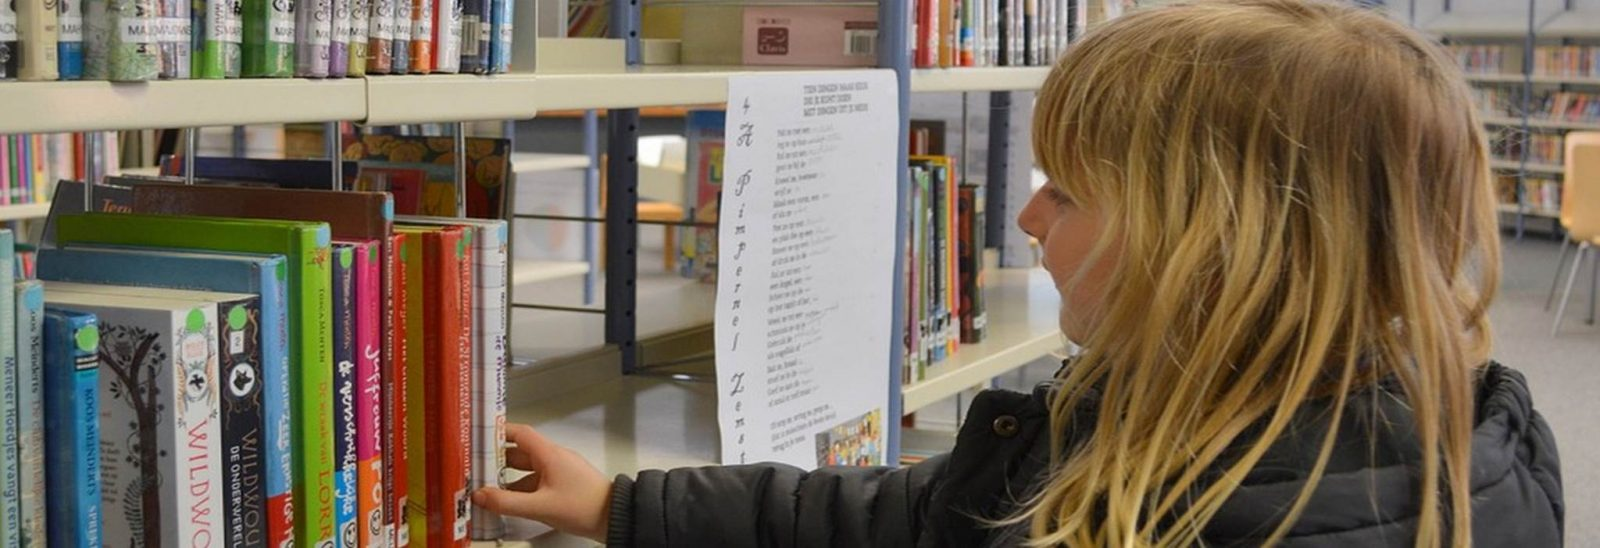 Bibliotheque-Noyal muzillac-Damgan la roche bernard tourisme